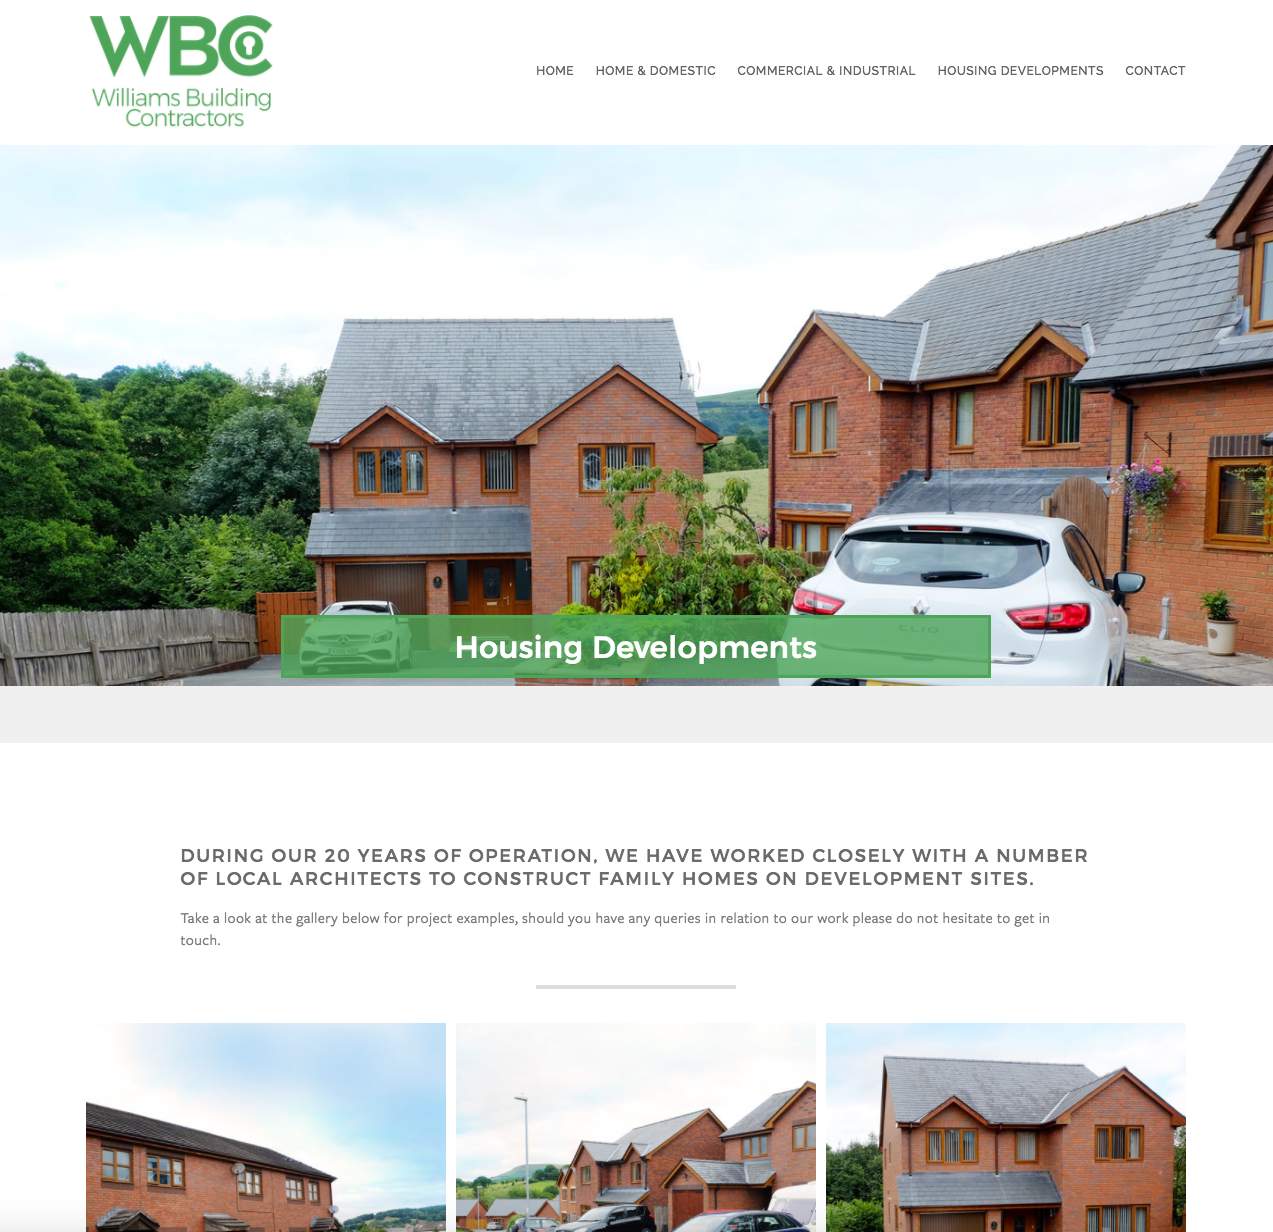 Web design project: Williams Building Contractors